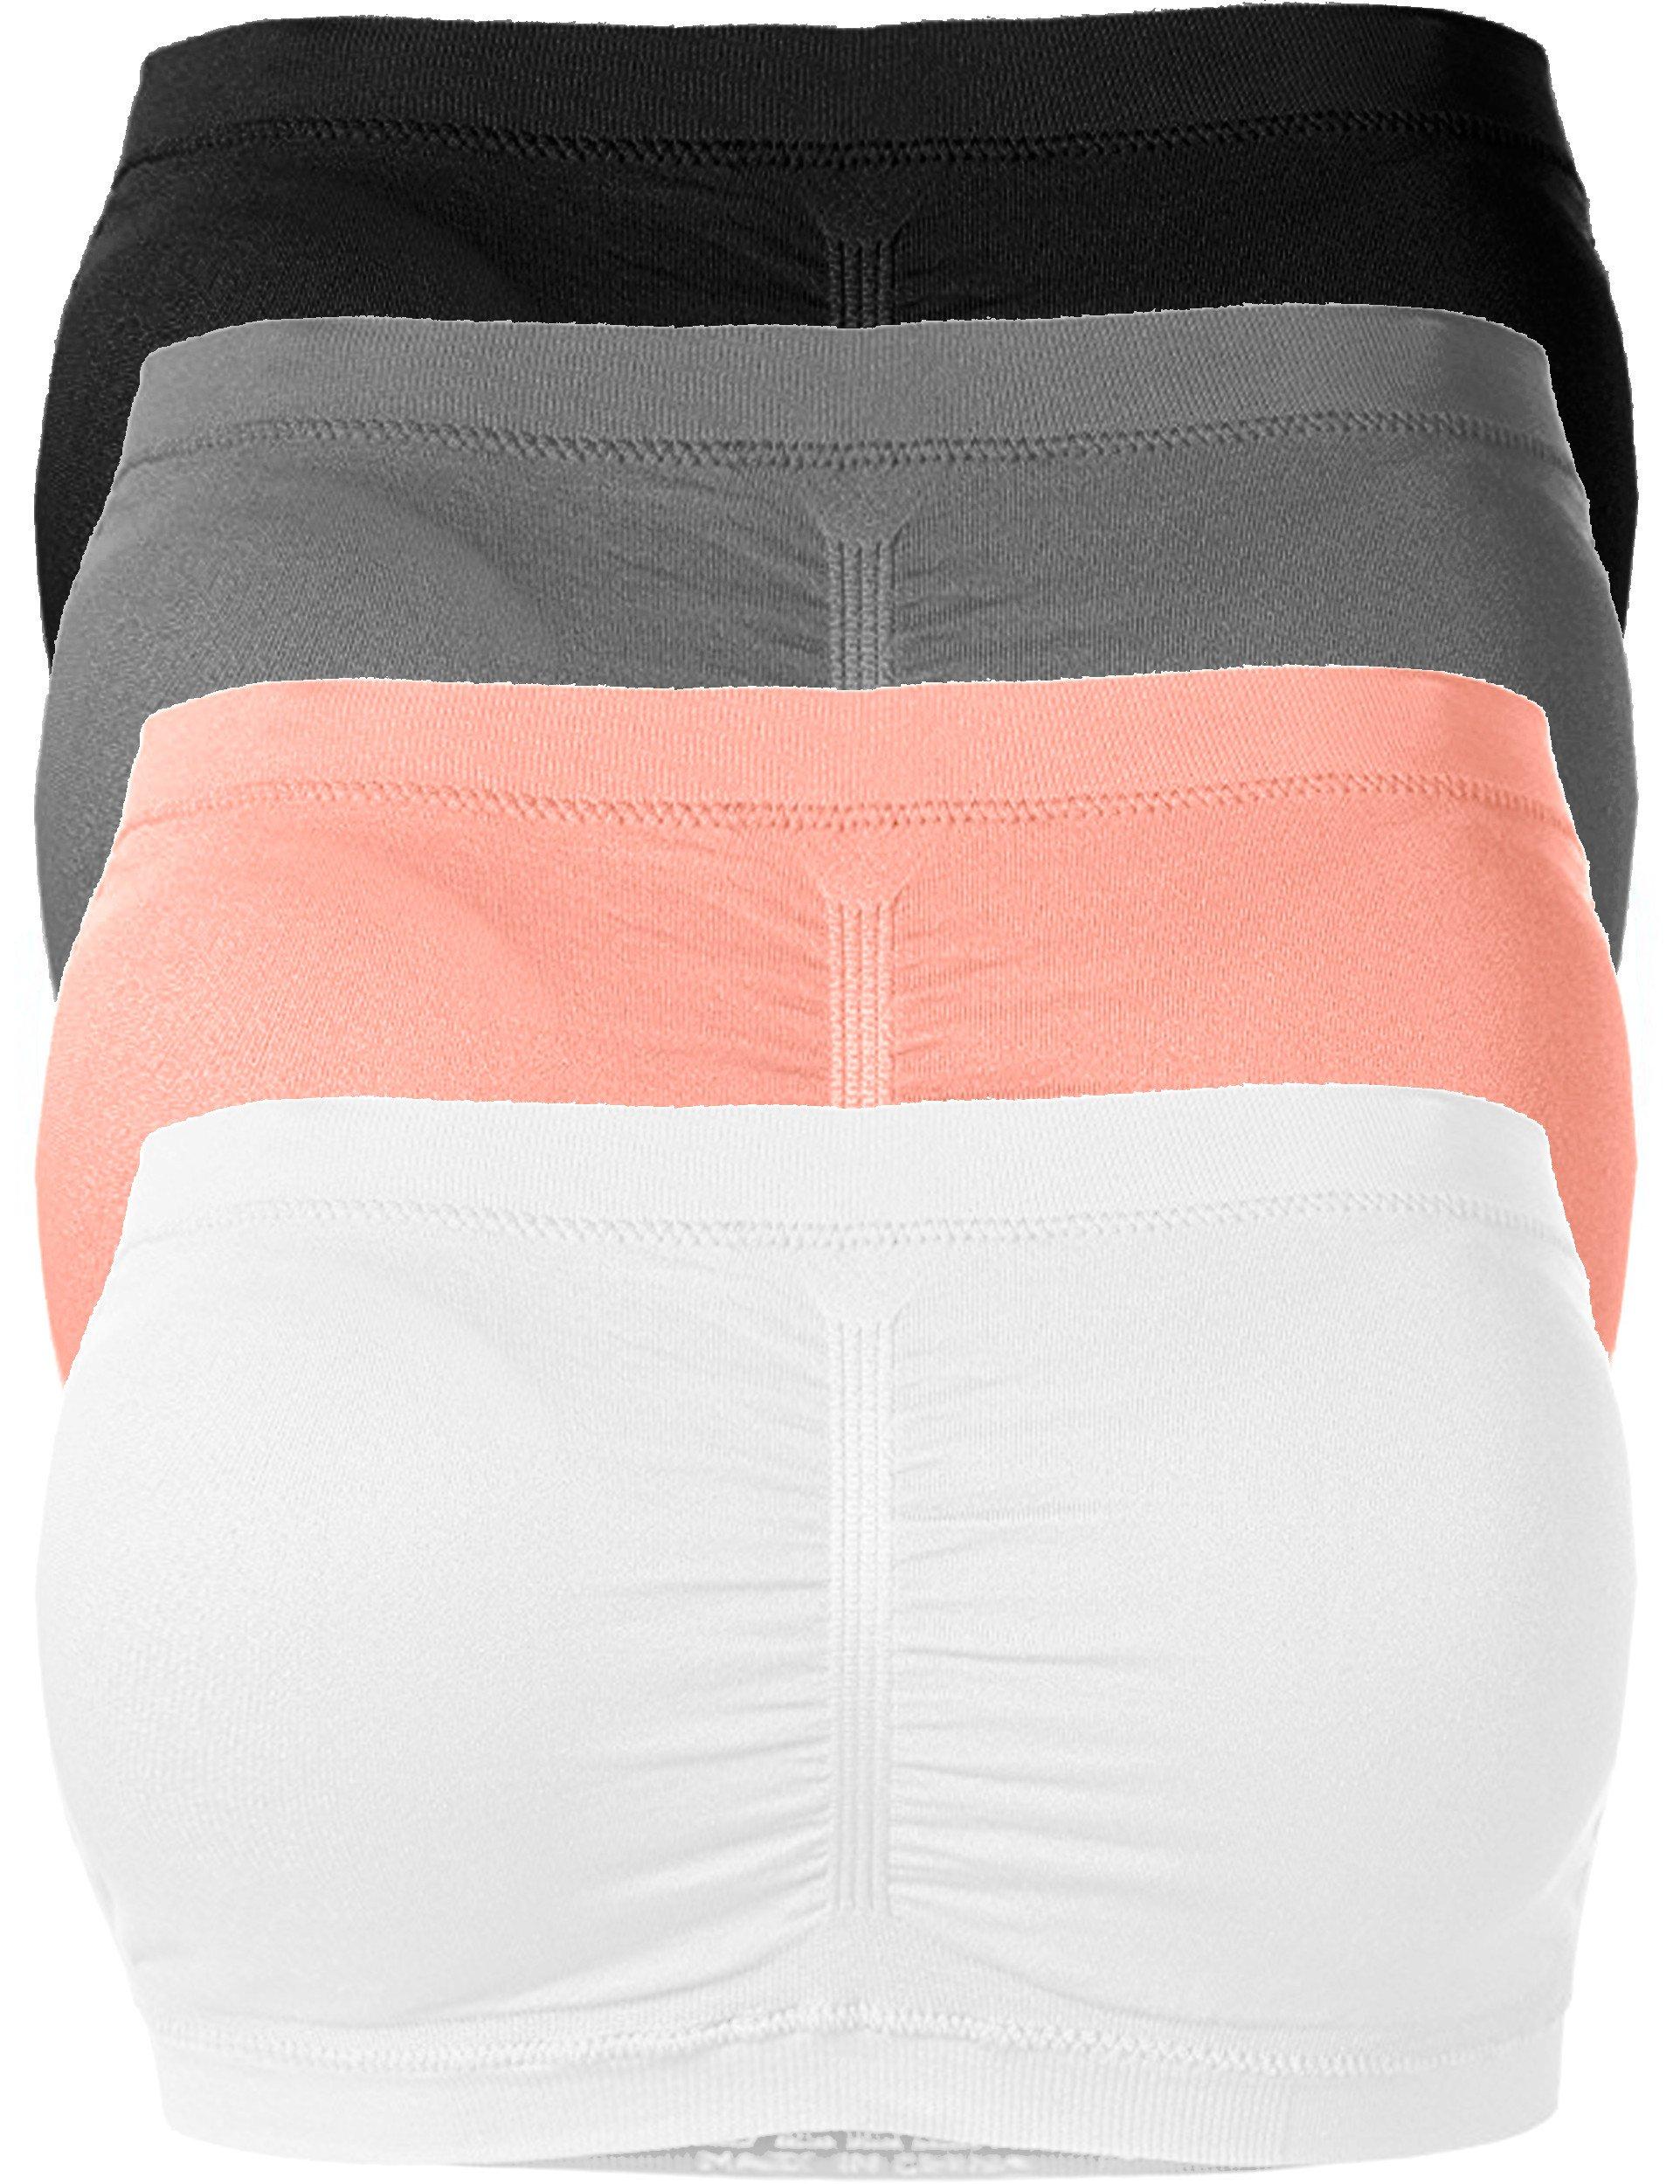 Ollie Arnes Women's One Size Strapless Padded Bandeau Stretchy Tube Bra SET4_BK_Char_Cor_WH OS